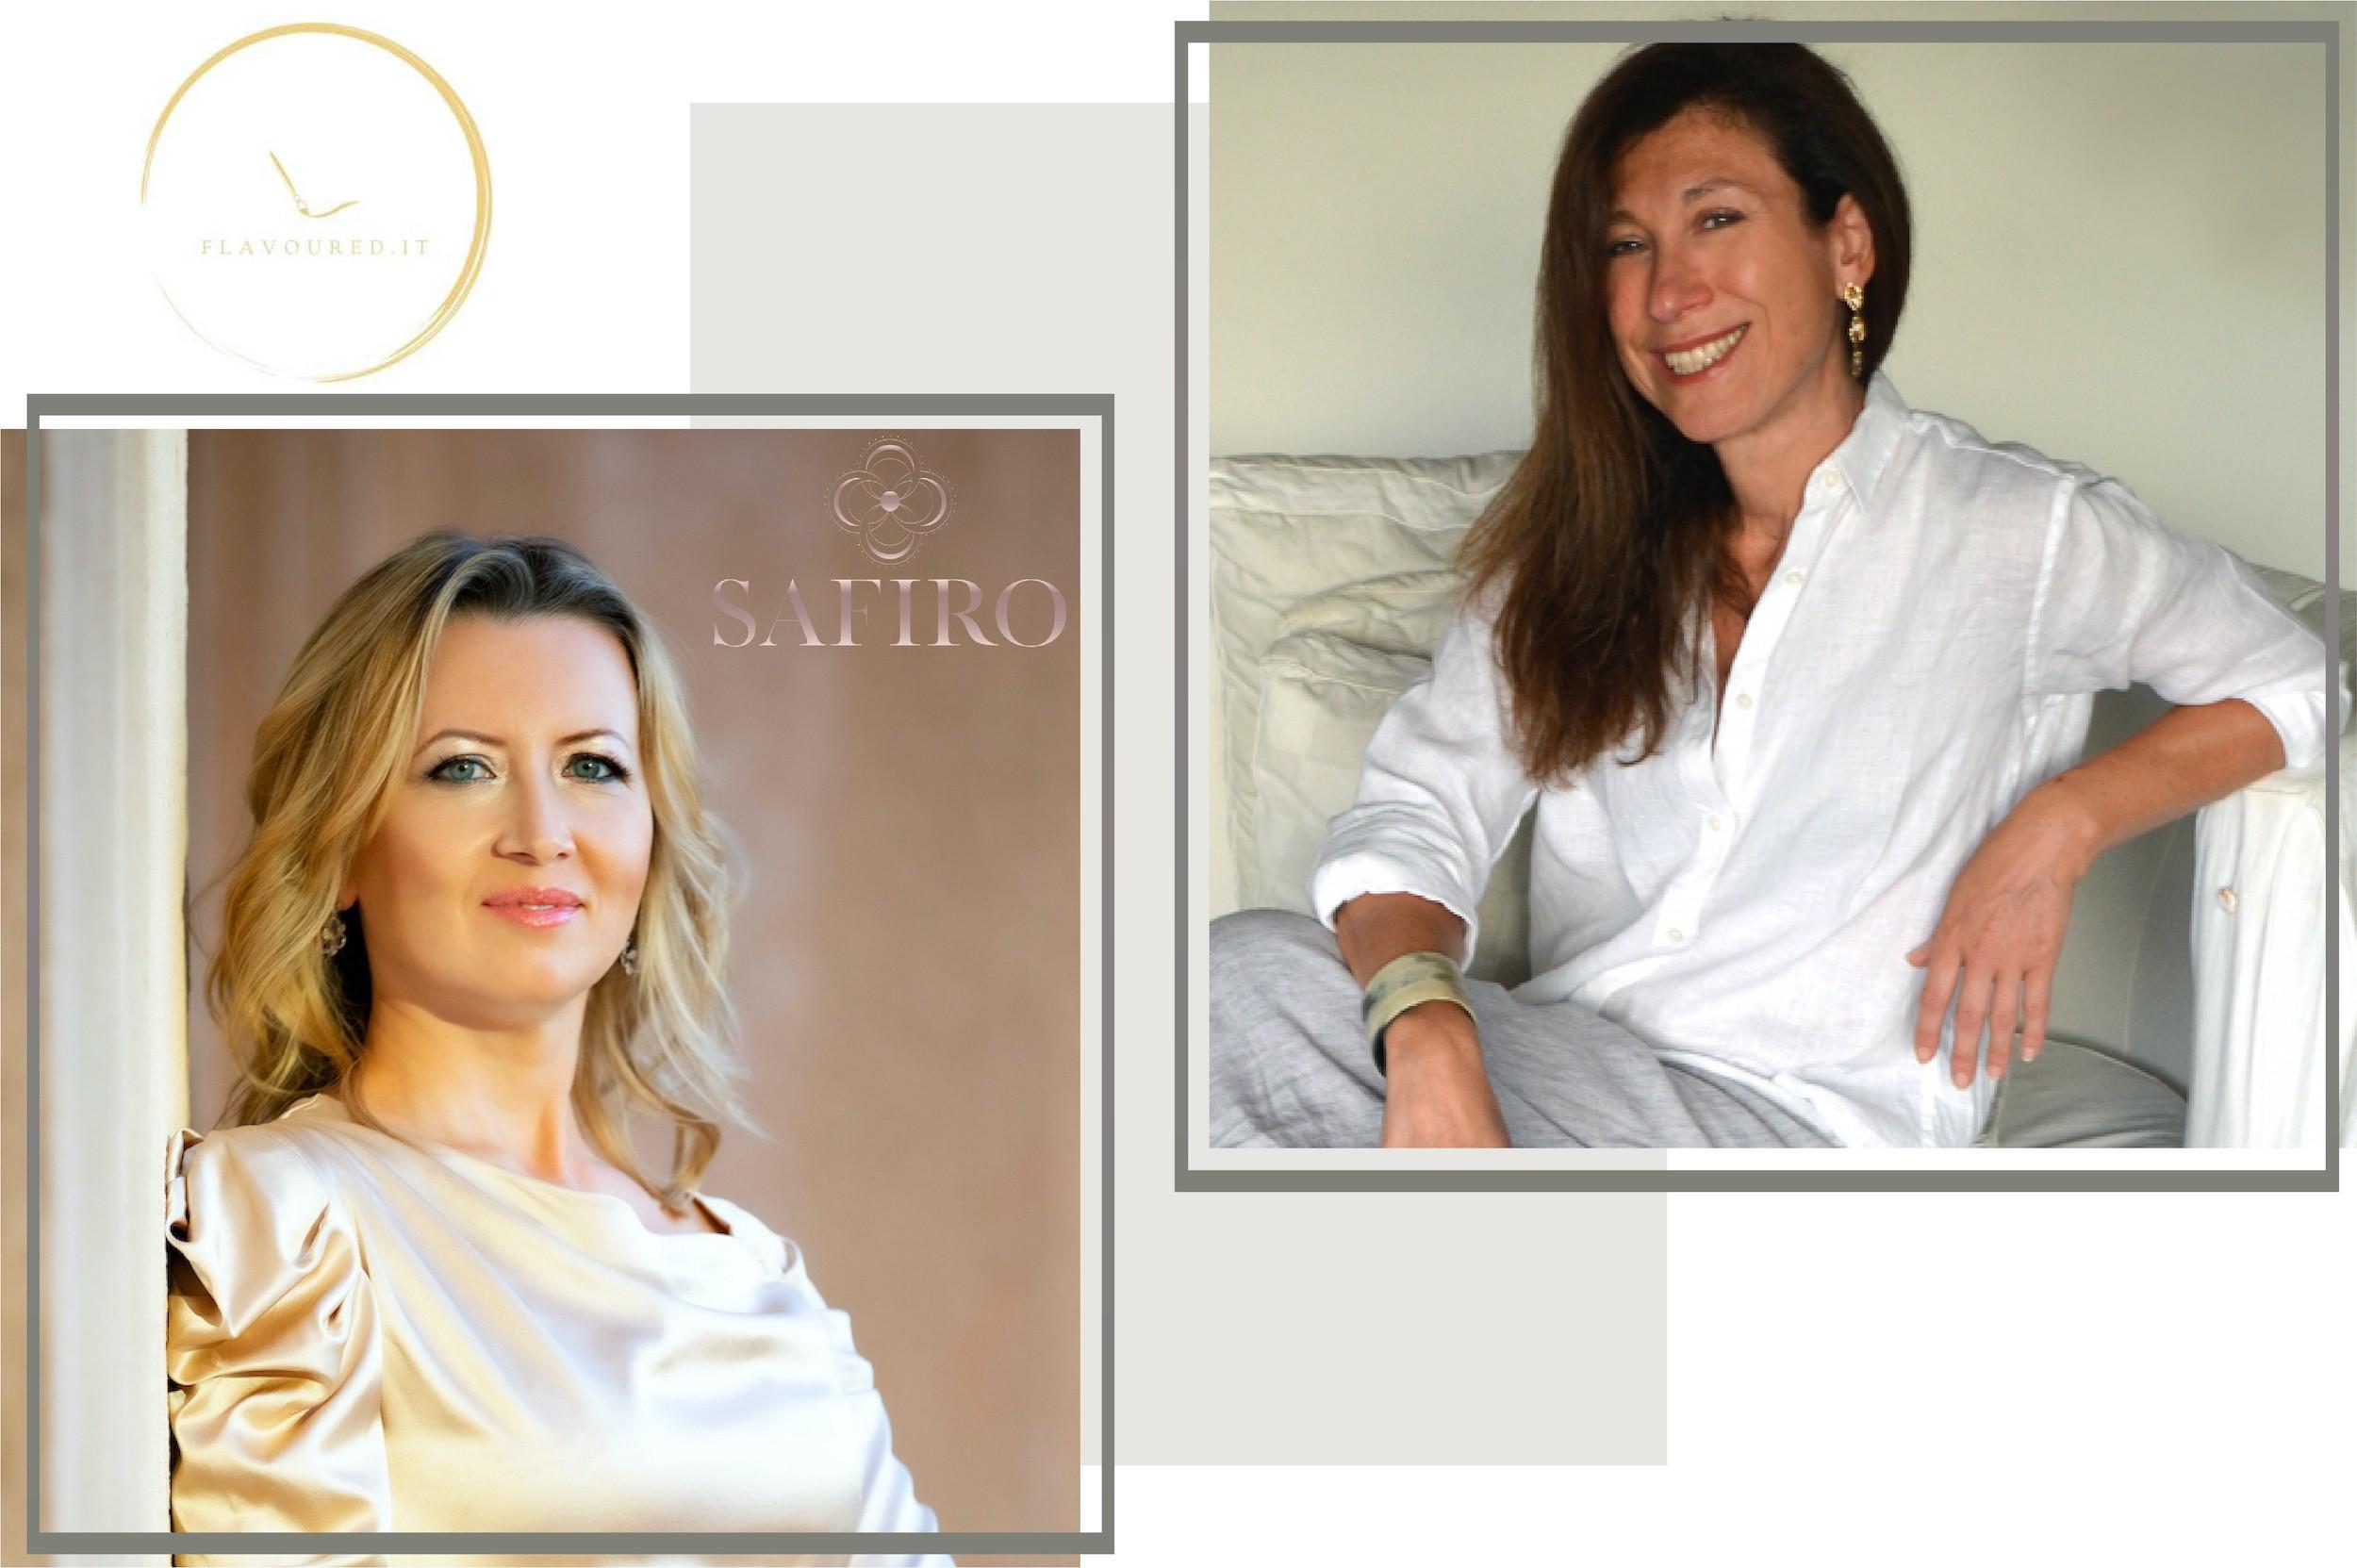 Sharing SAFIRO Story - Flavoured.it Podcast Safiro